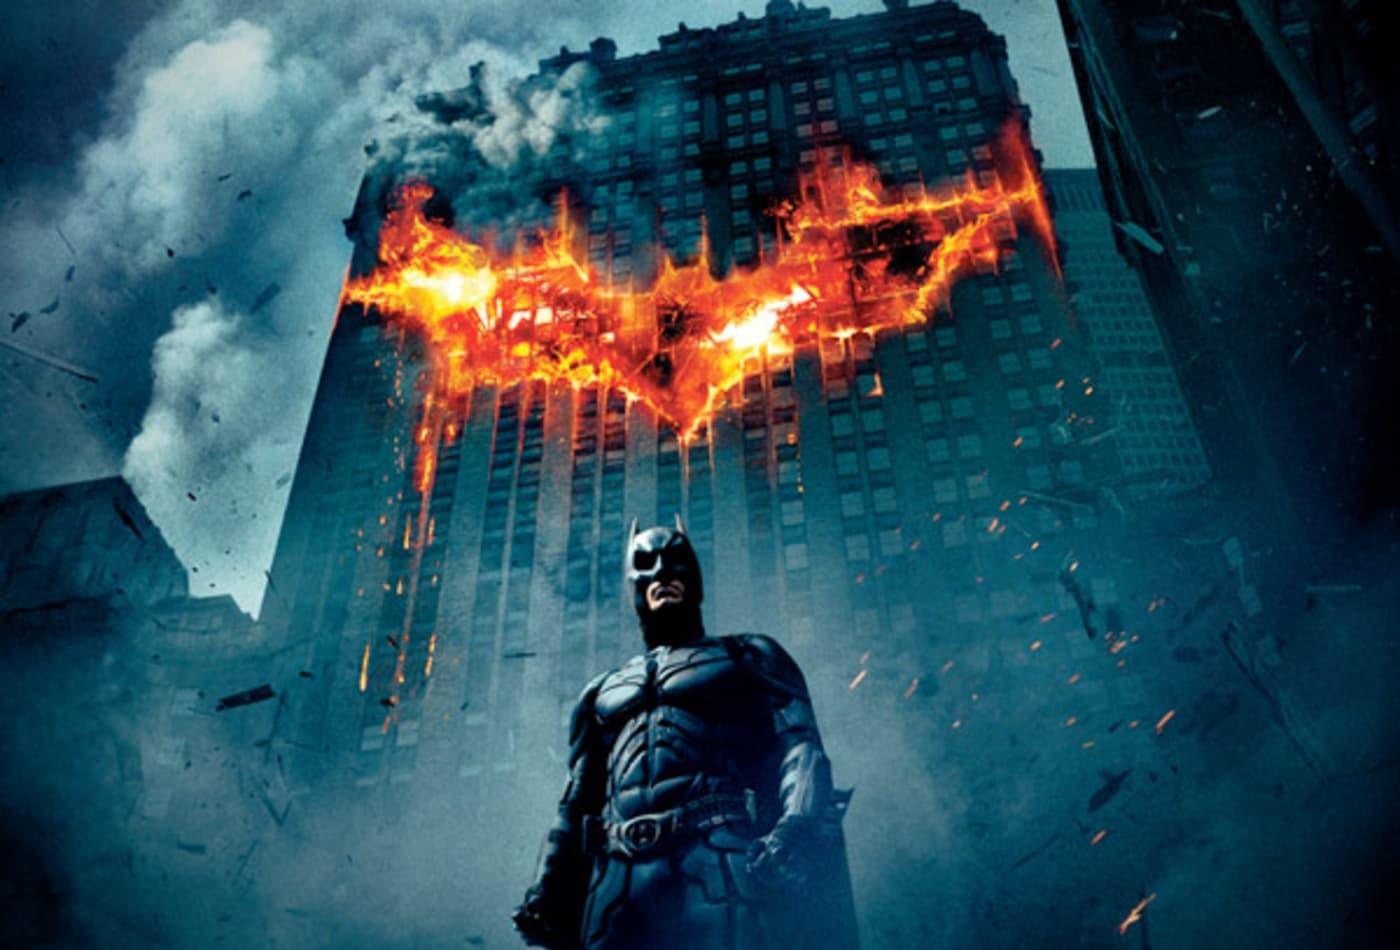 46955347 CNBC_superhero_films_2011_Batman.jpg